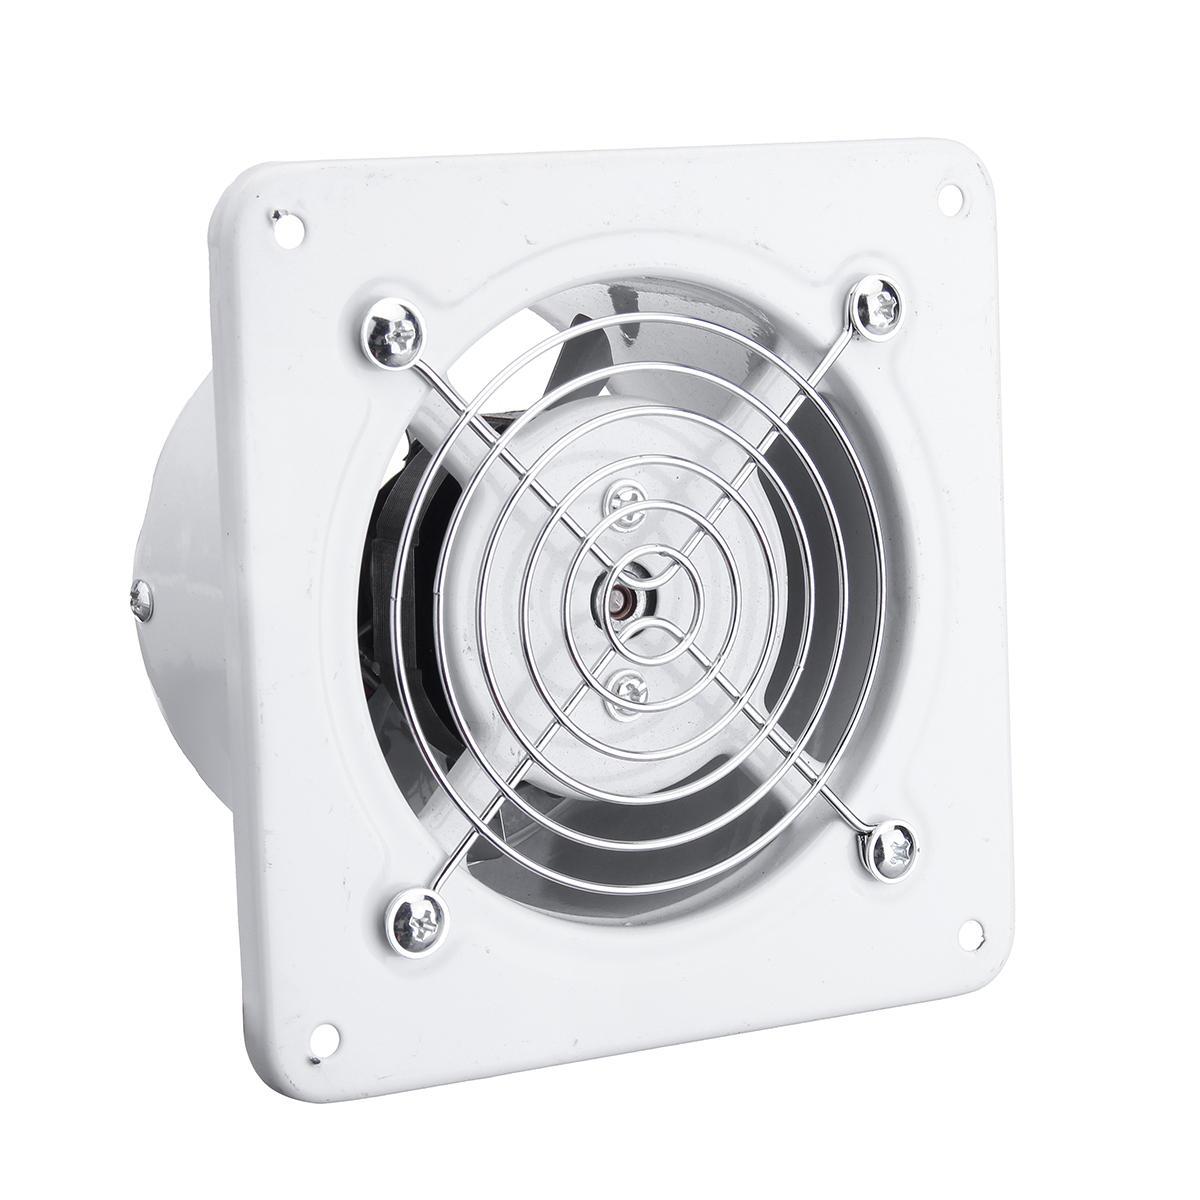 4 Inch Silent Ventilation Fan Bathroom Garage Exhaust Fan Ceiling